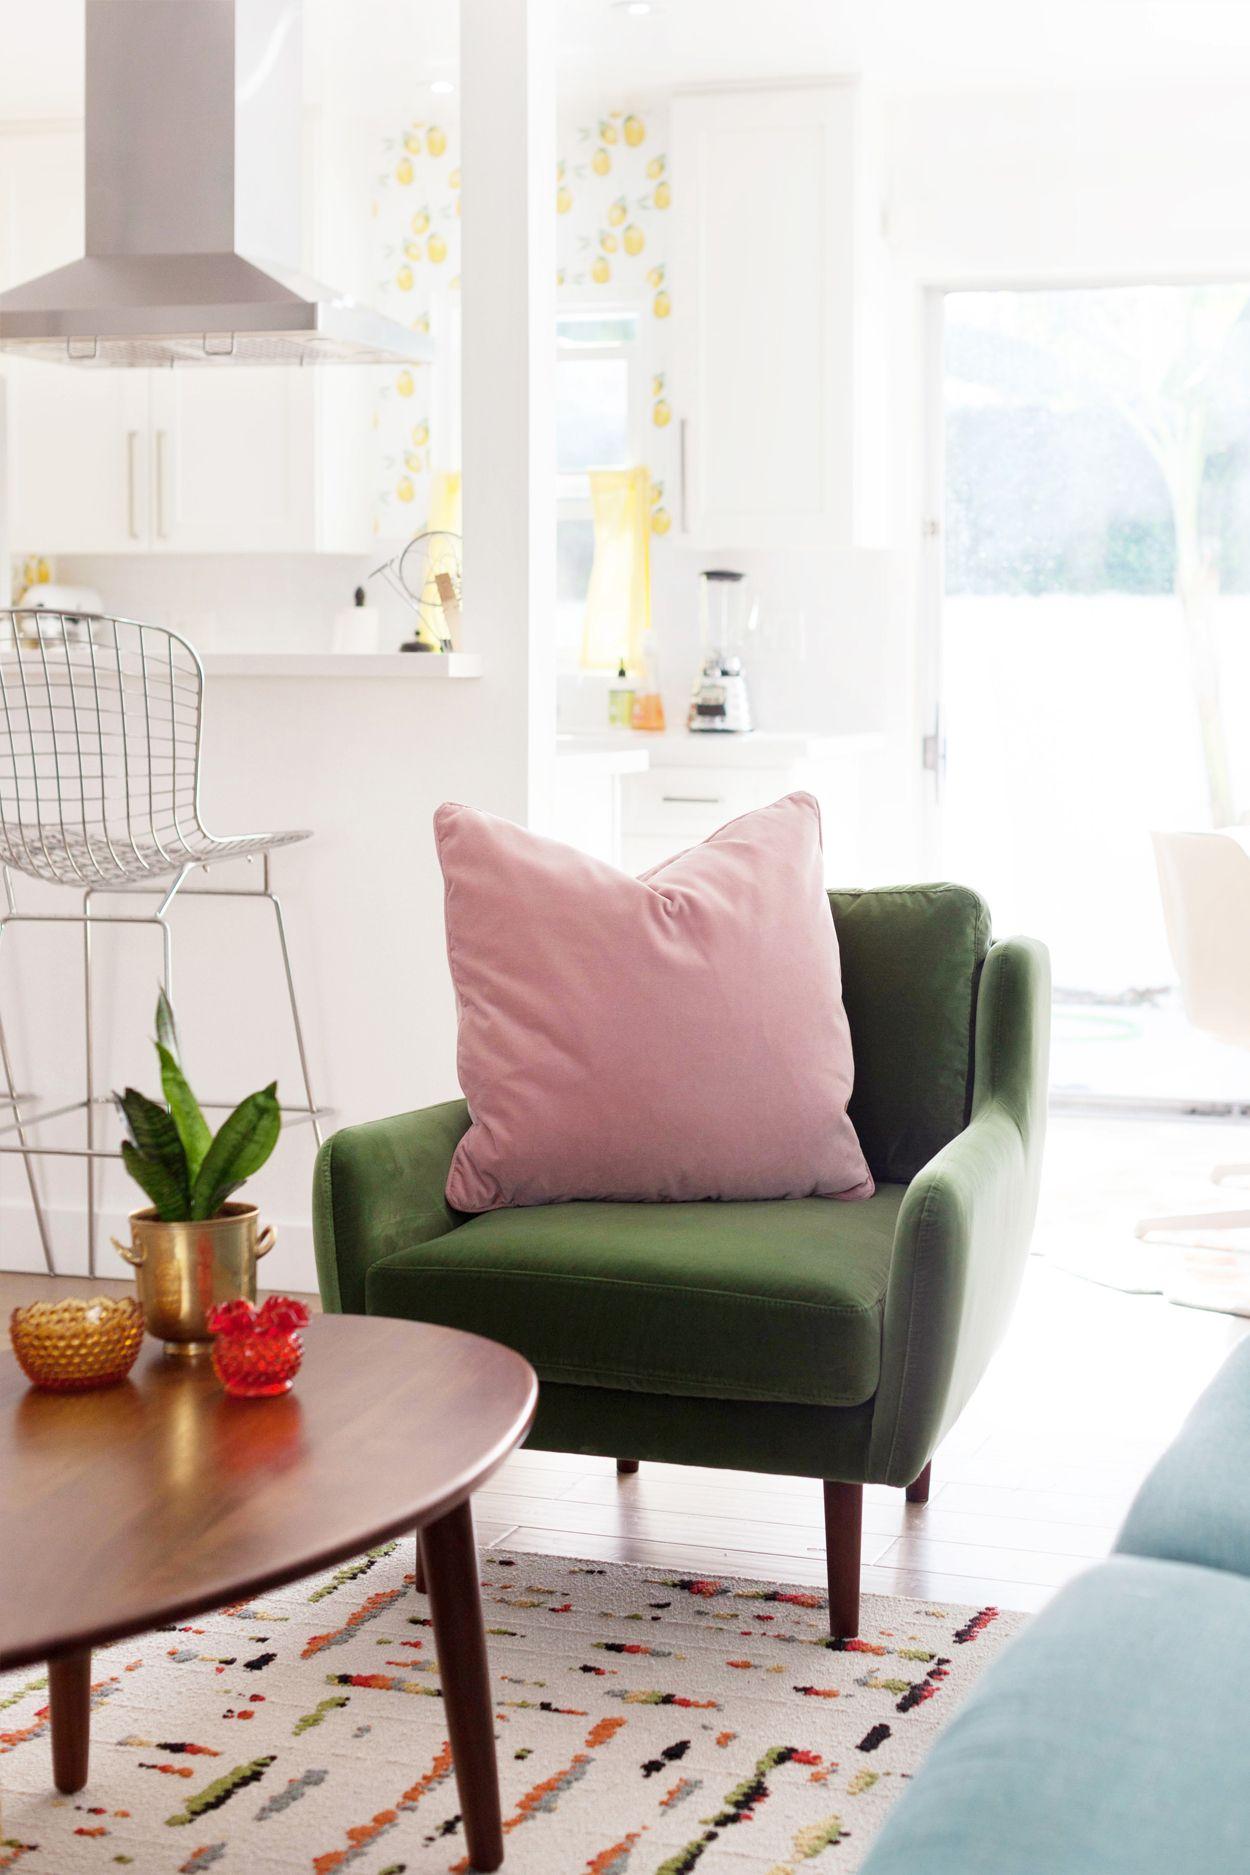 Modern Walnut Living Room Furniture: Green Velvet Chair In Walnut Wood Legs